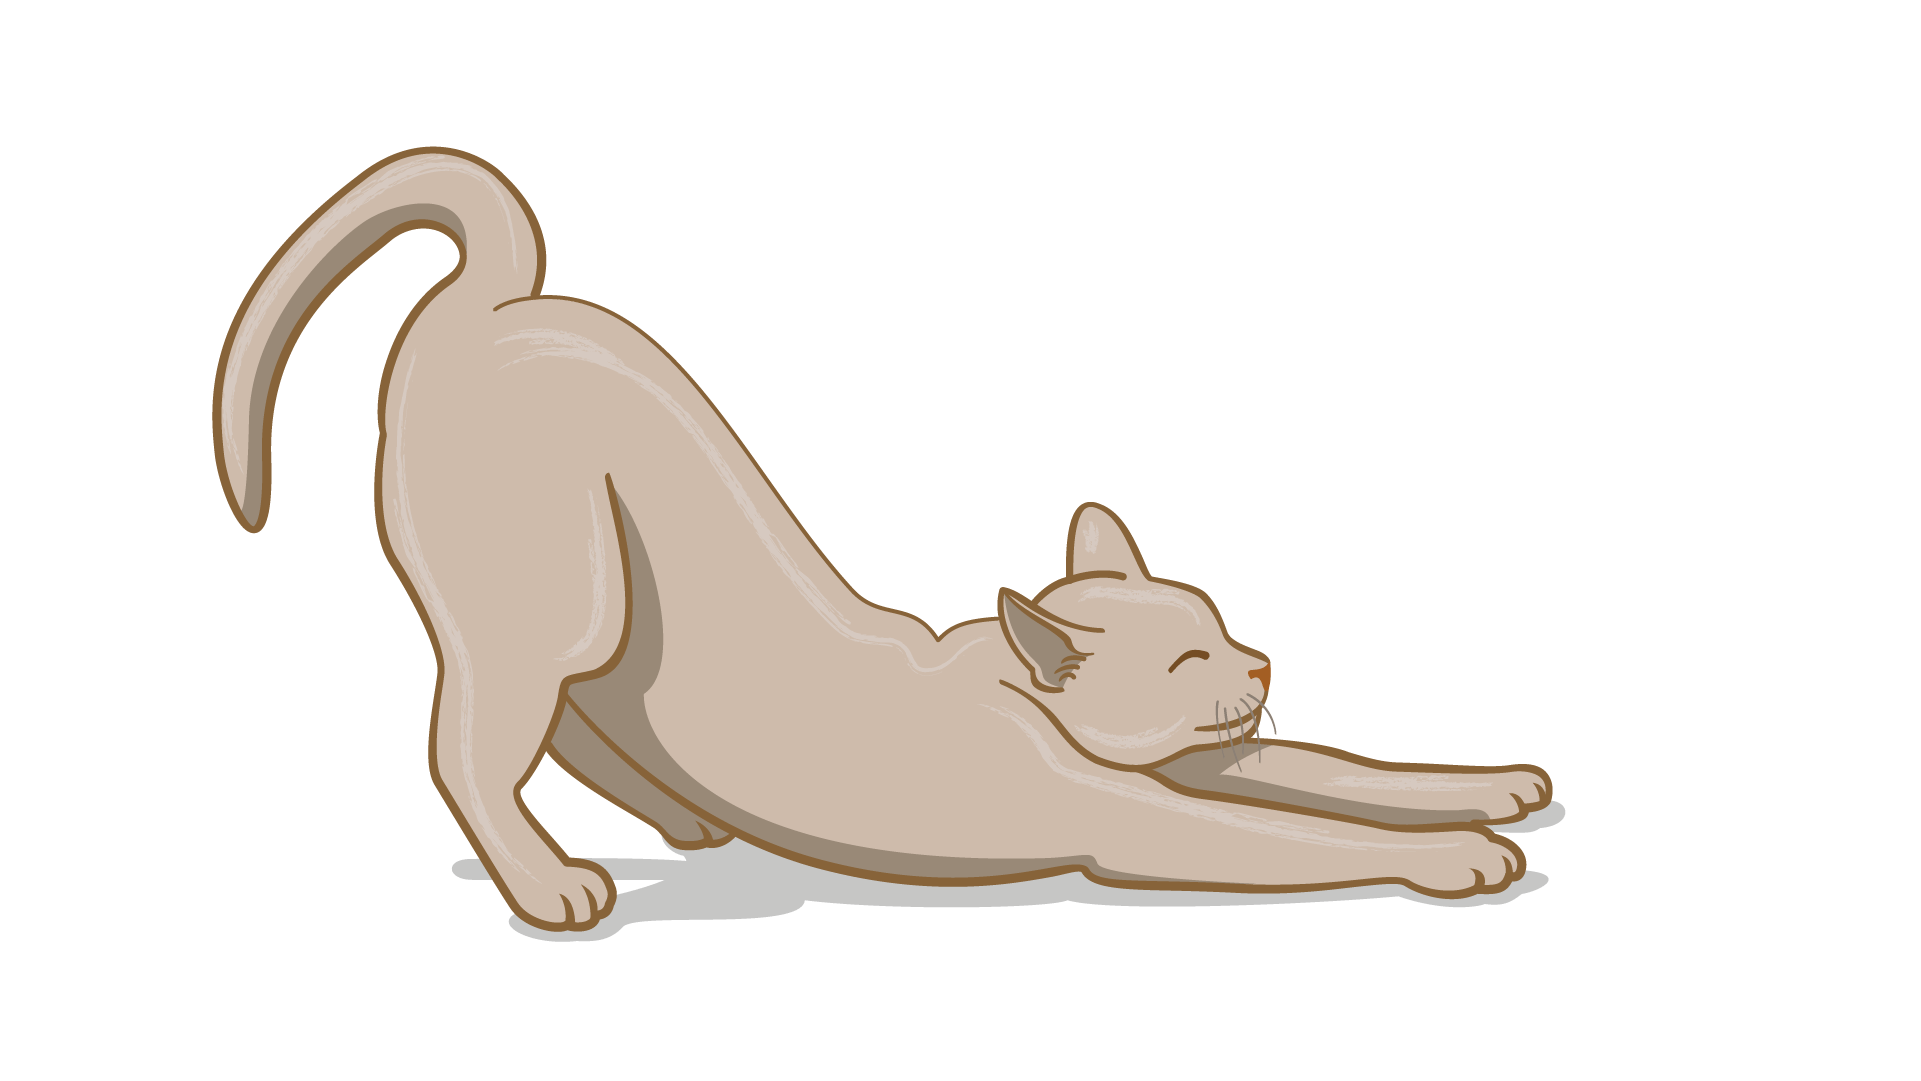 lenguaje corporal de gato aliviado